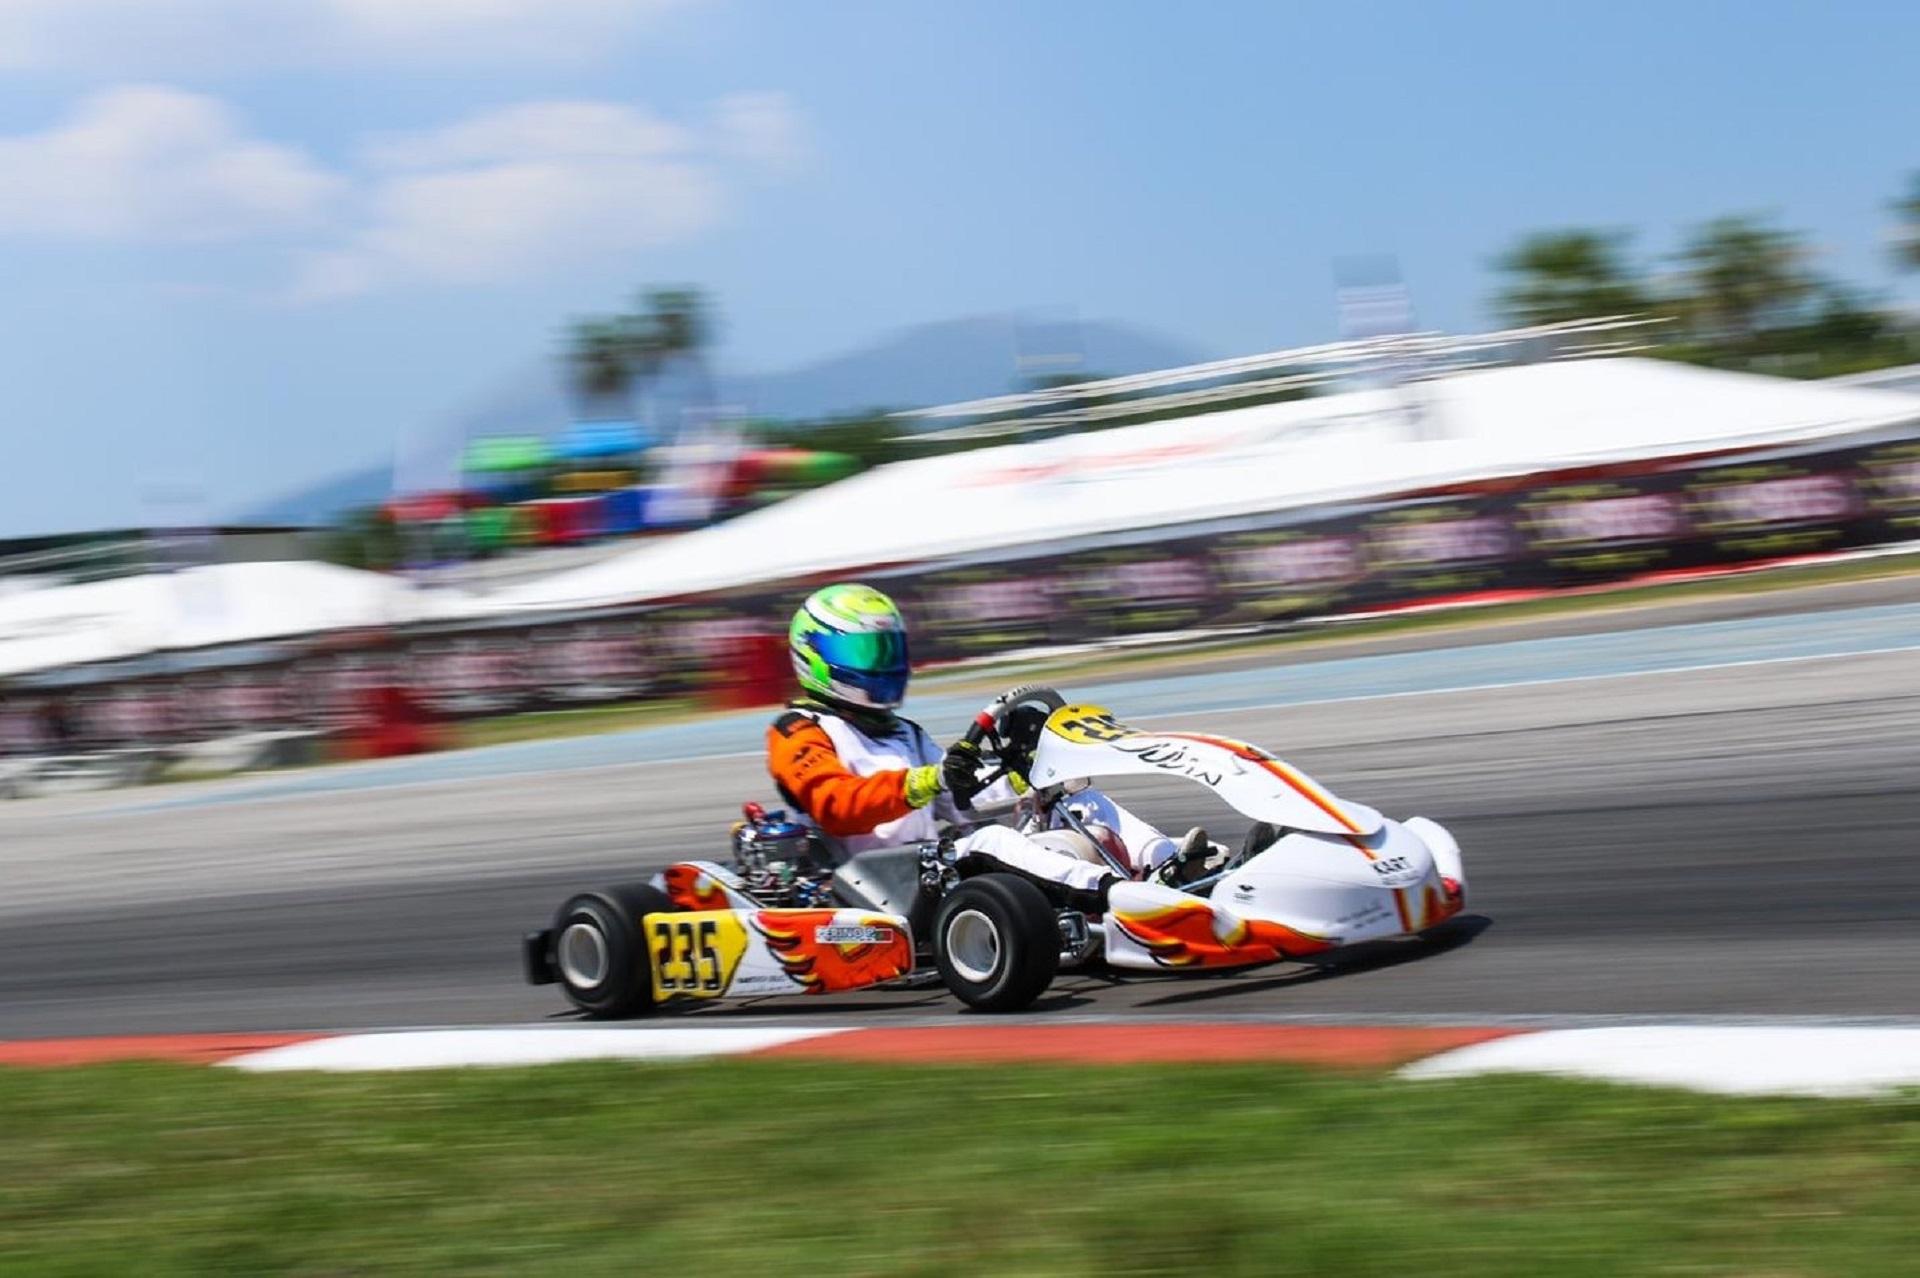 Pedro Perino garante presença final no WSK no Circuito Internacional de Nápoles